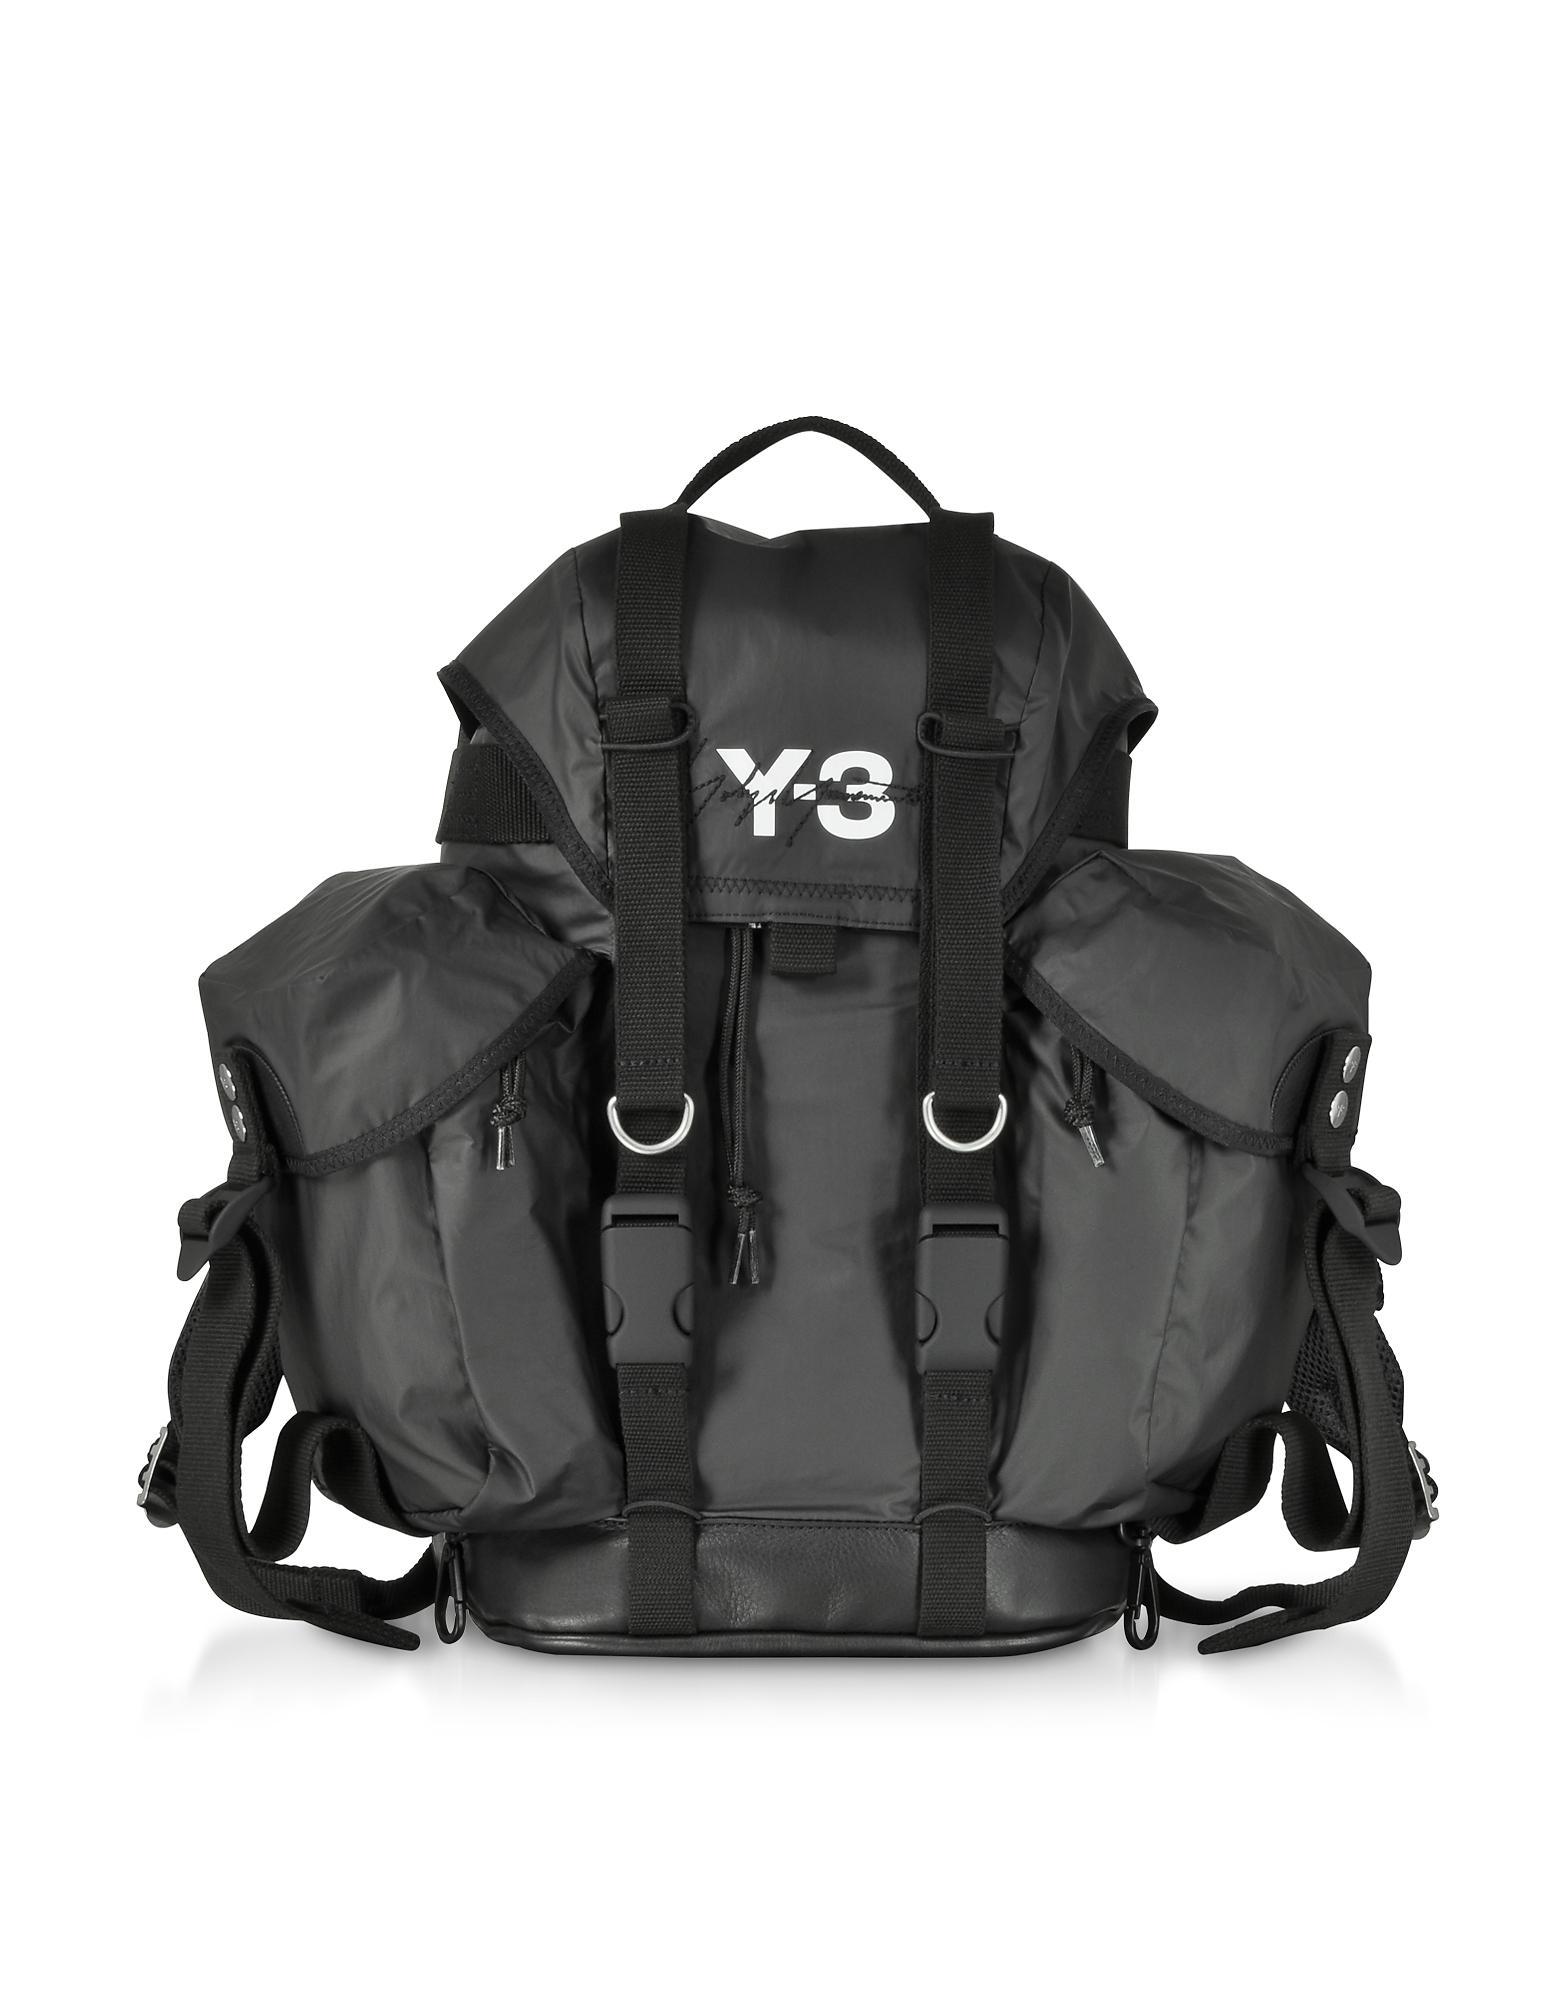 Lyst - Y-3 Black Nylon Xs Utility Backpack in Black for Men 0bd4a98094df2